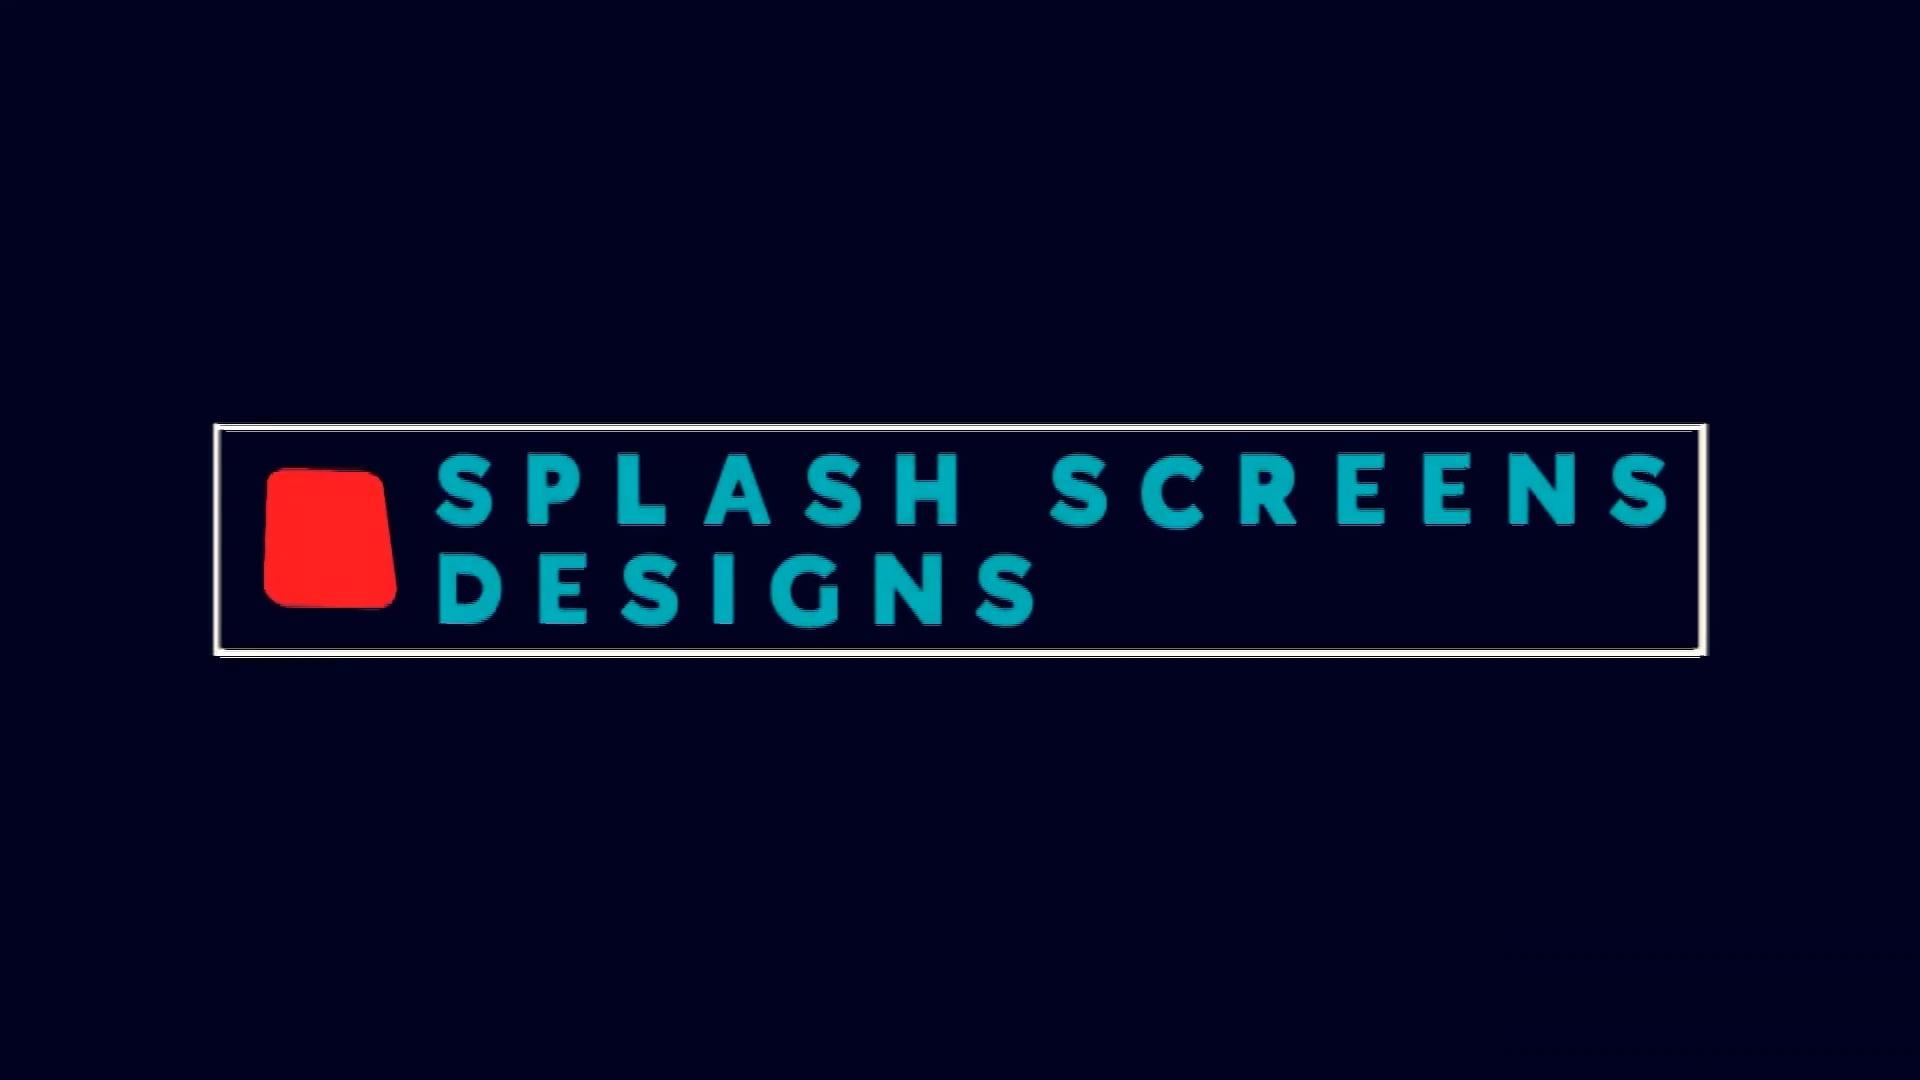 Lair of the Clockwork God infinite procedural splash screens